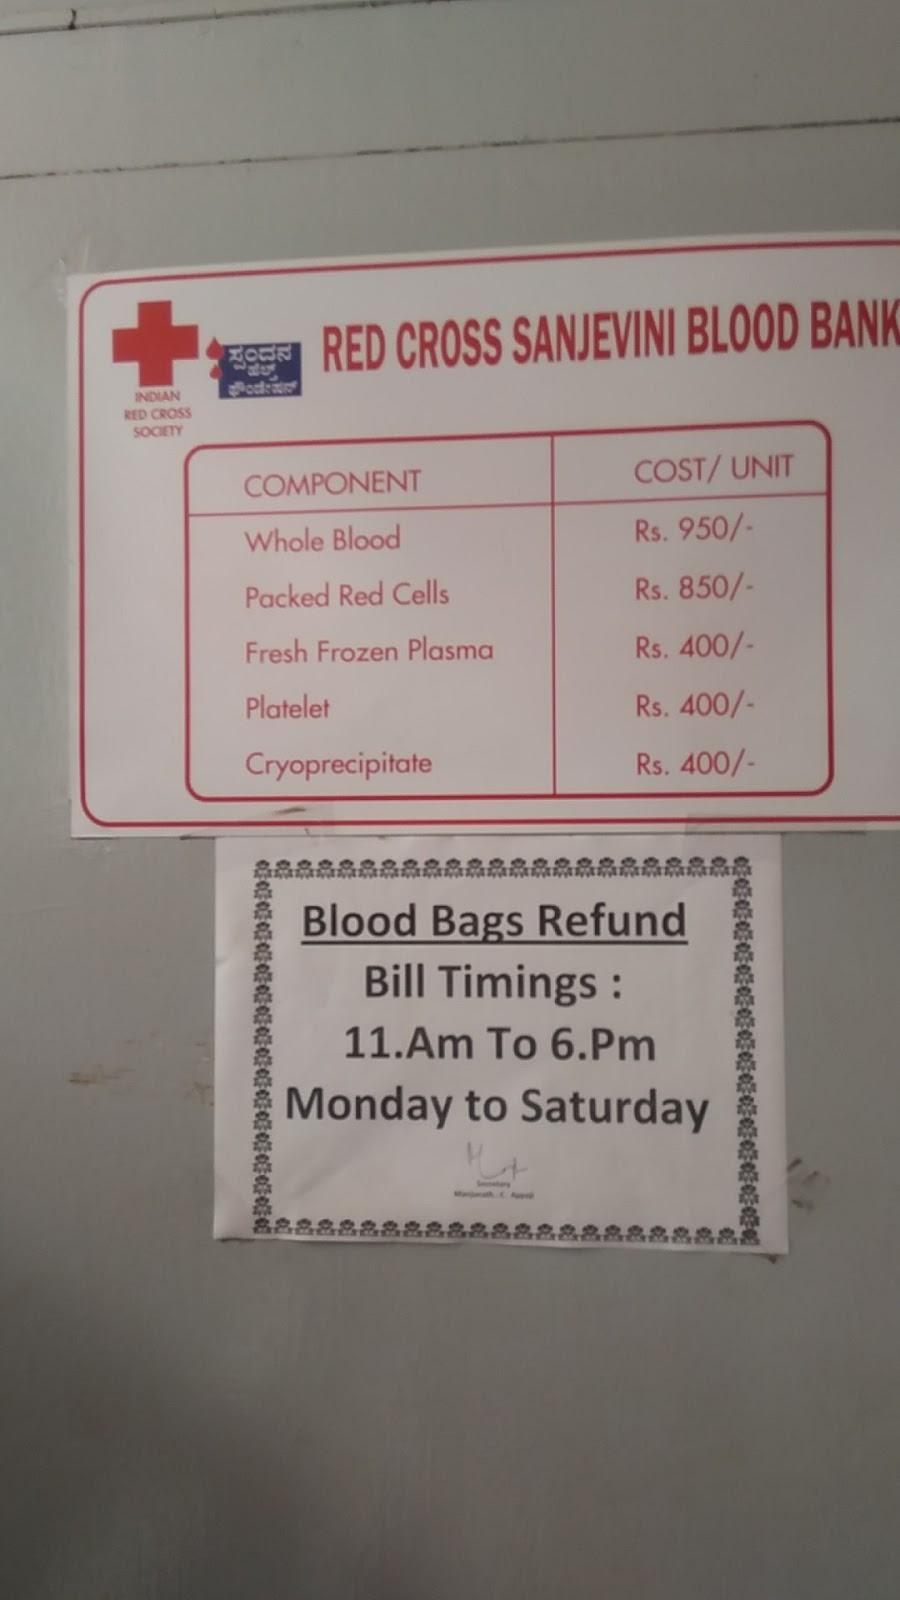 blood bank Sanjeevini Blood Bank near Shivamogga Karnataka